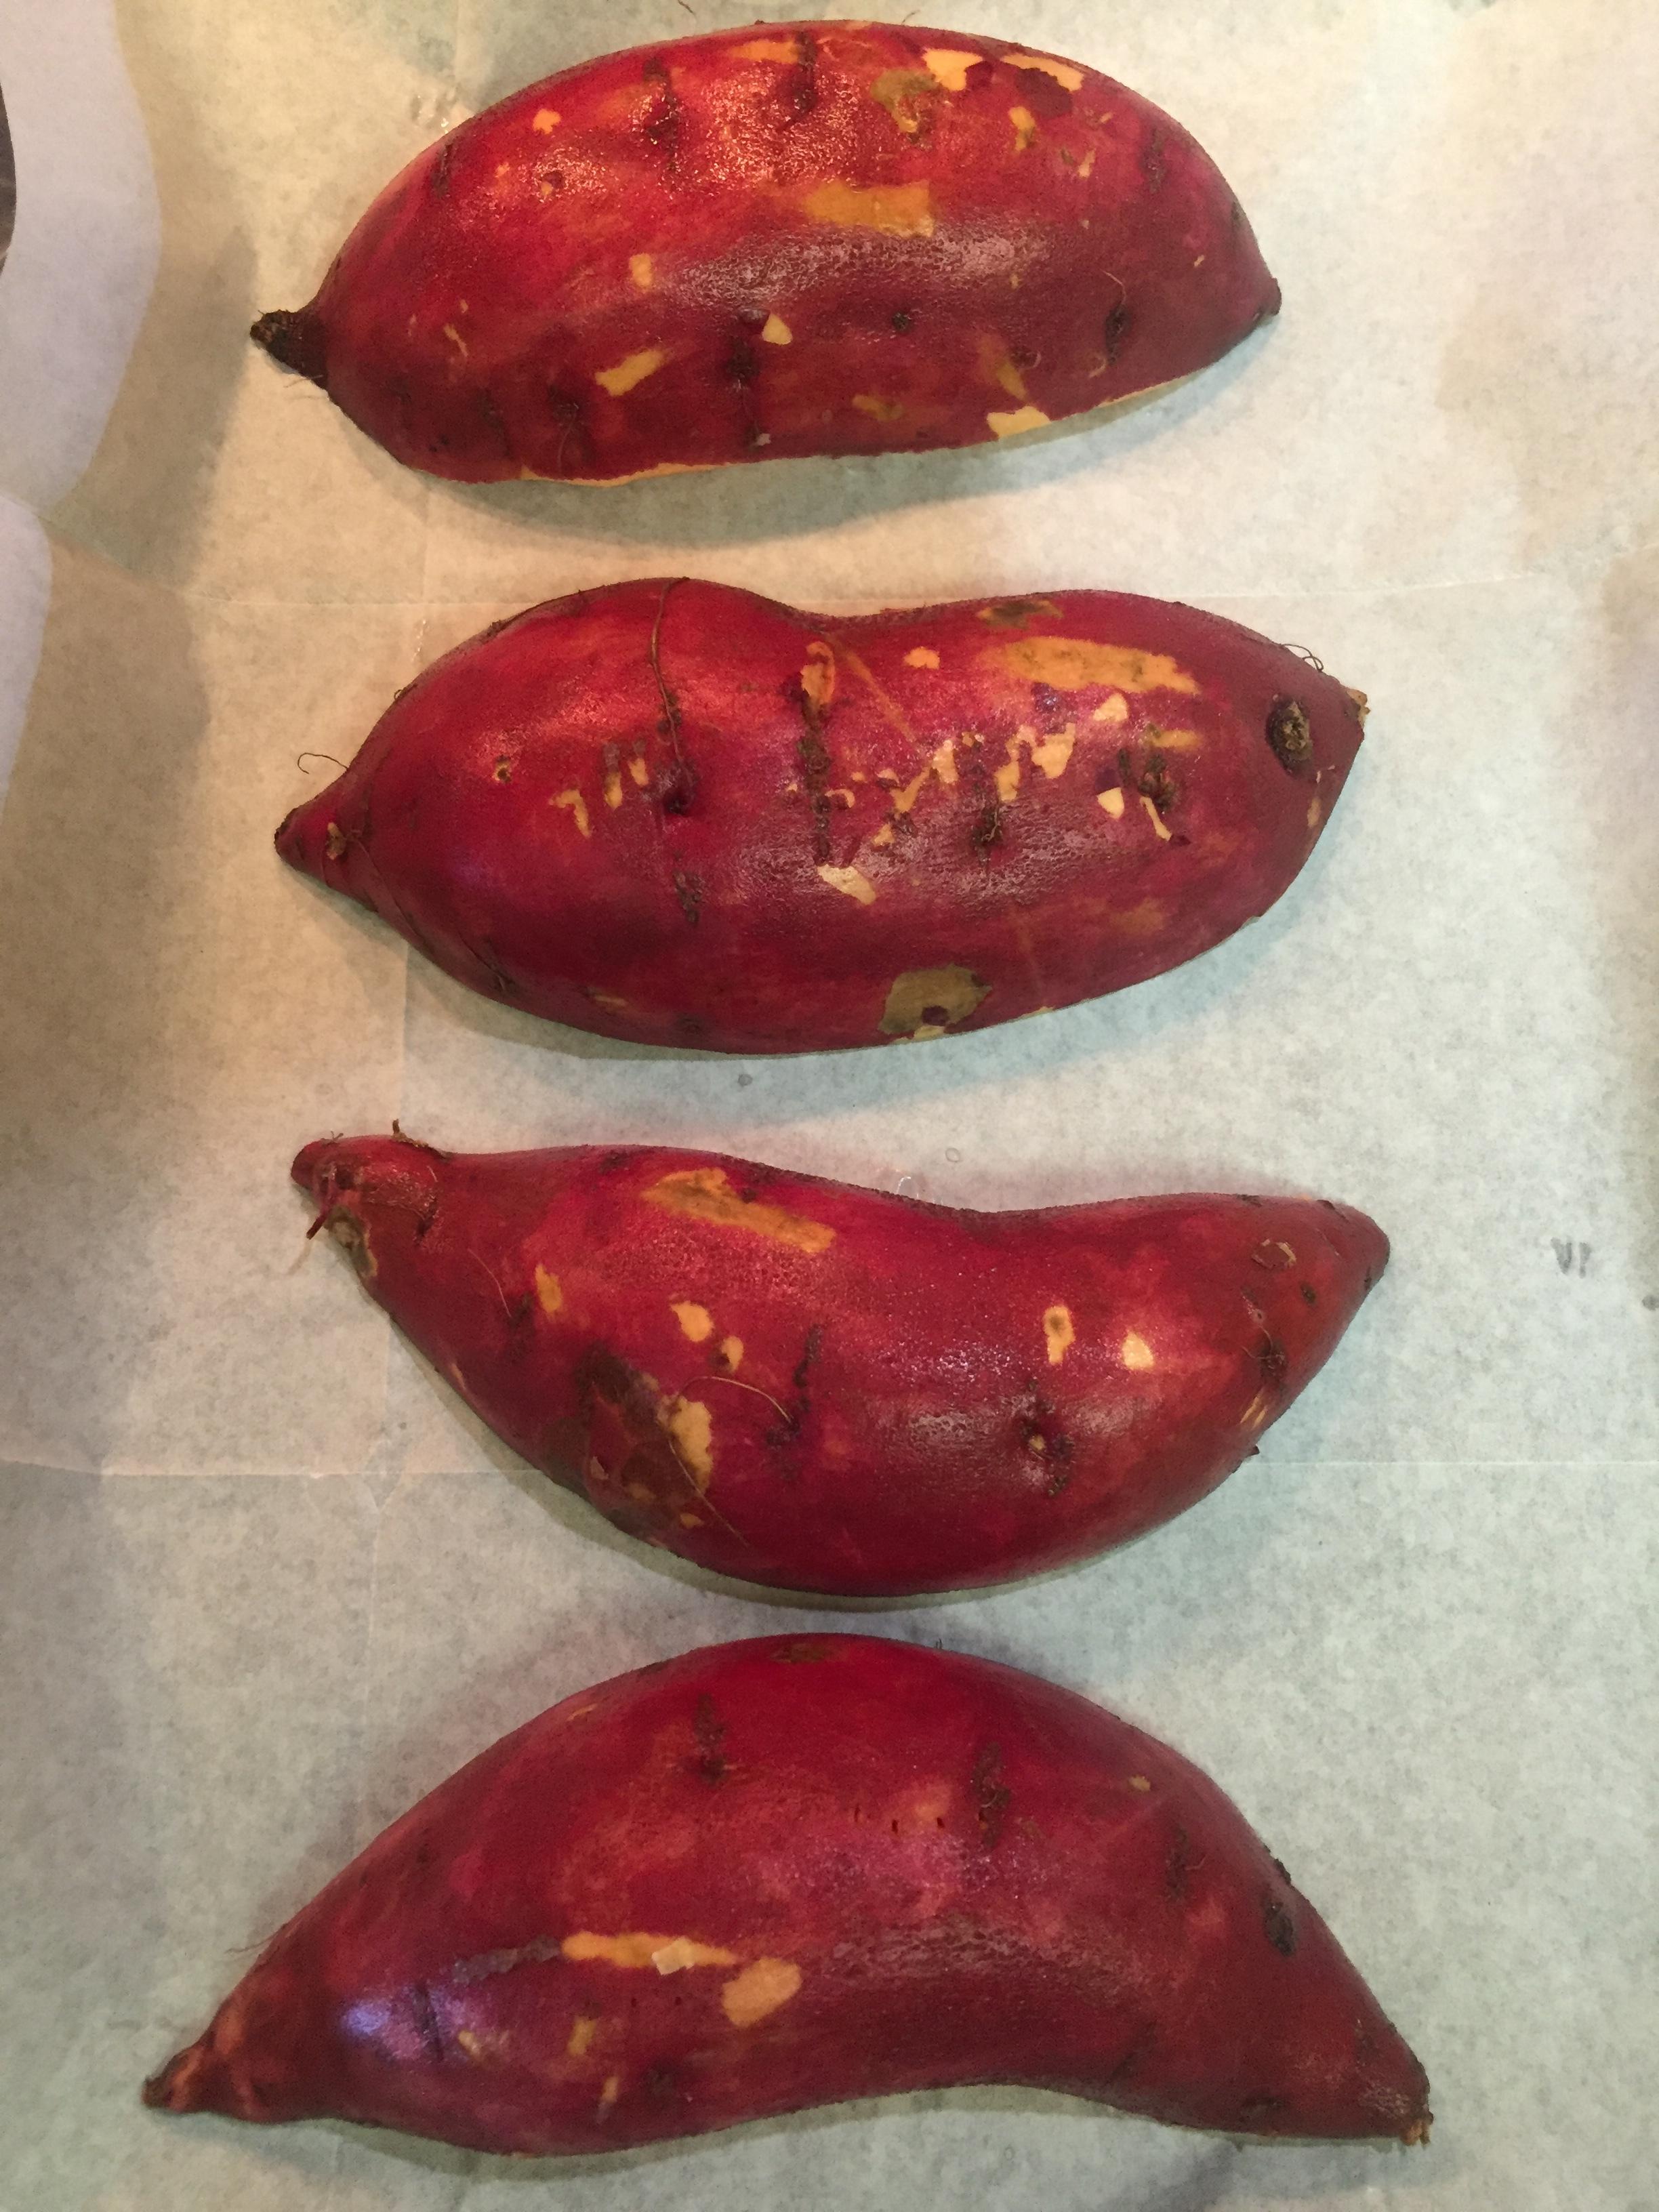 Oklahoma grown sweet potatoes ready for roasting.